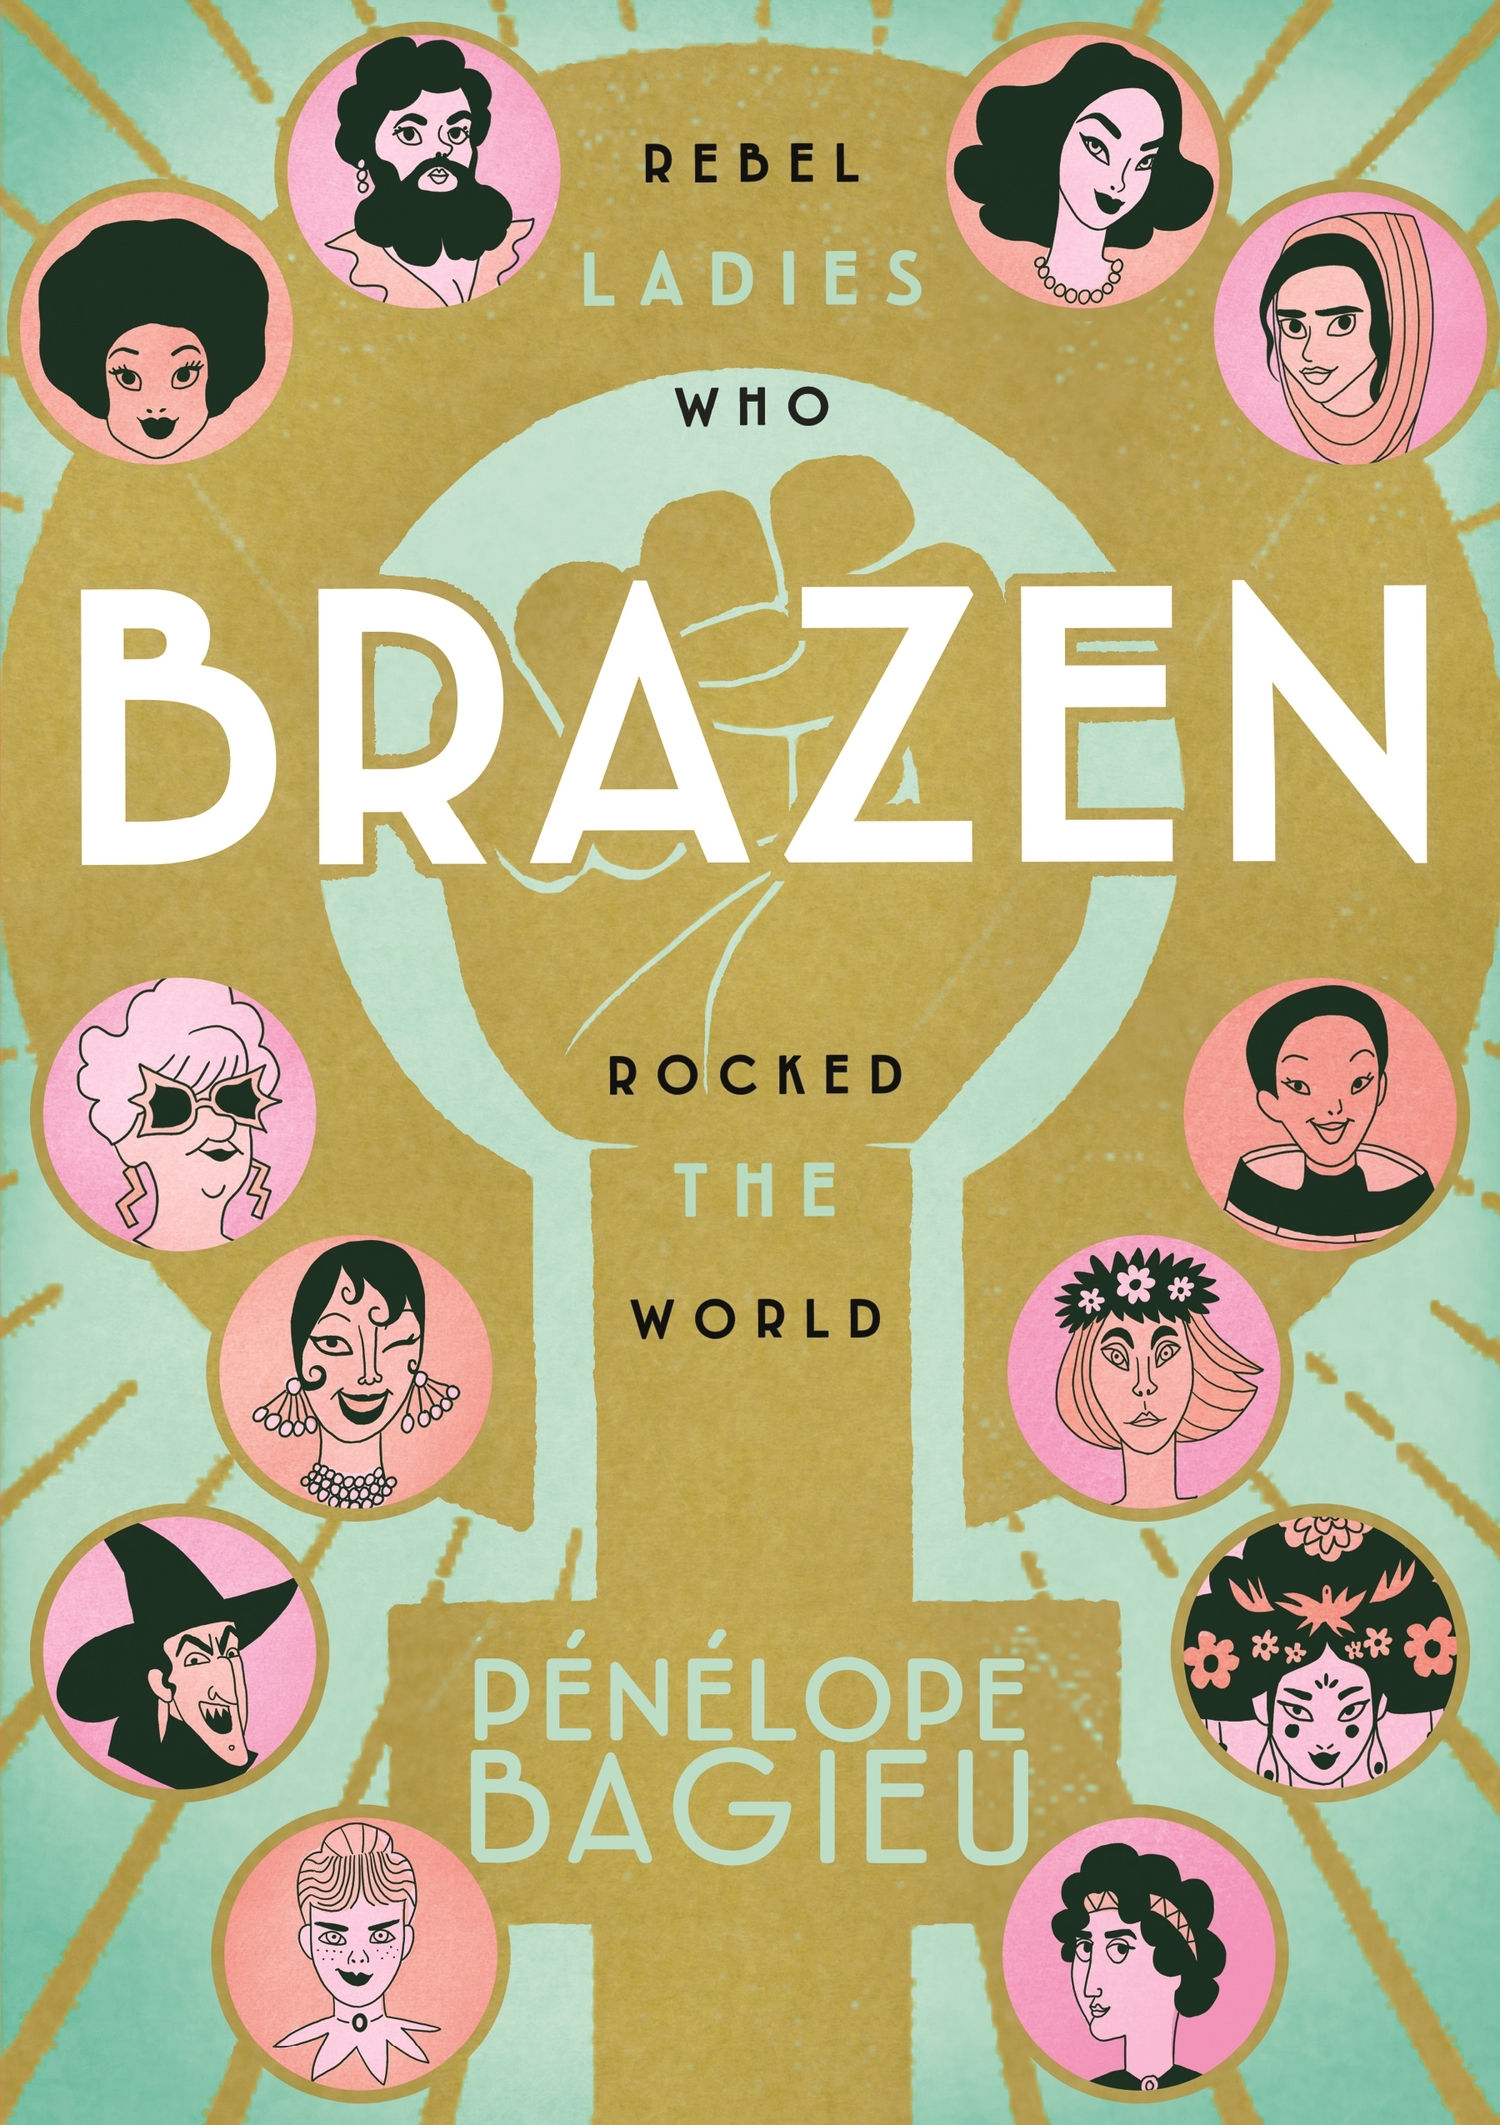 BWW Review: BRAZEN: Rebel Ladies Who Rocked the World by Pénélope Bagieu